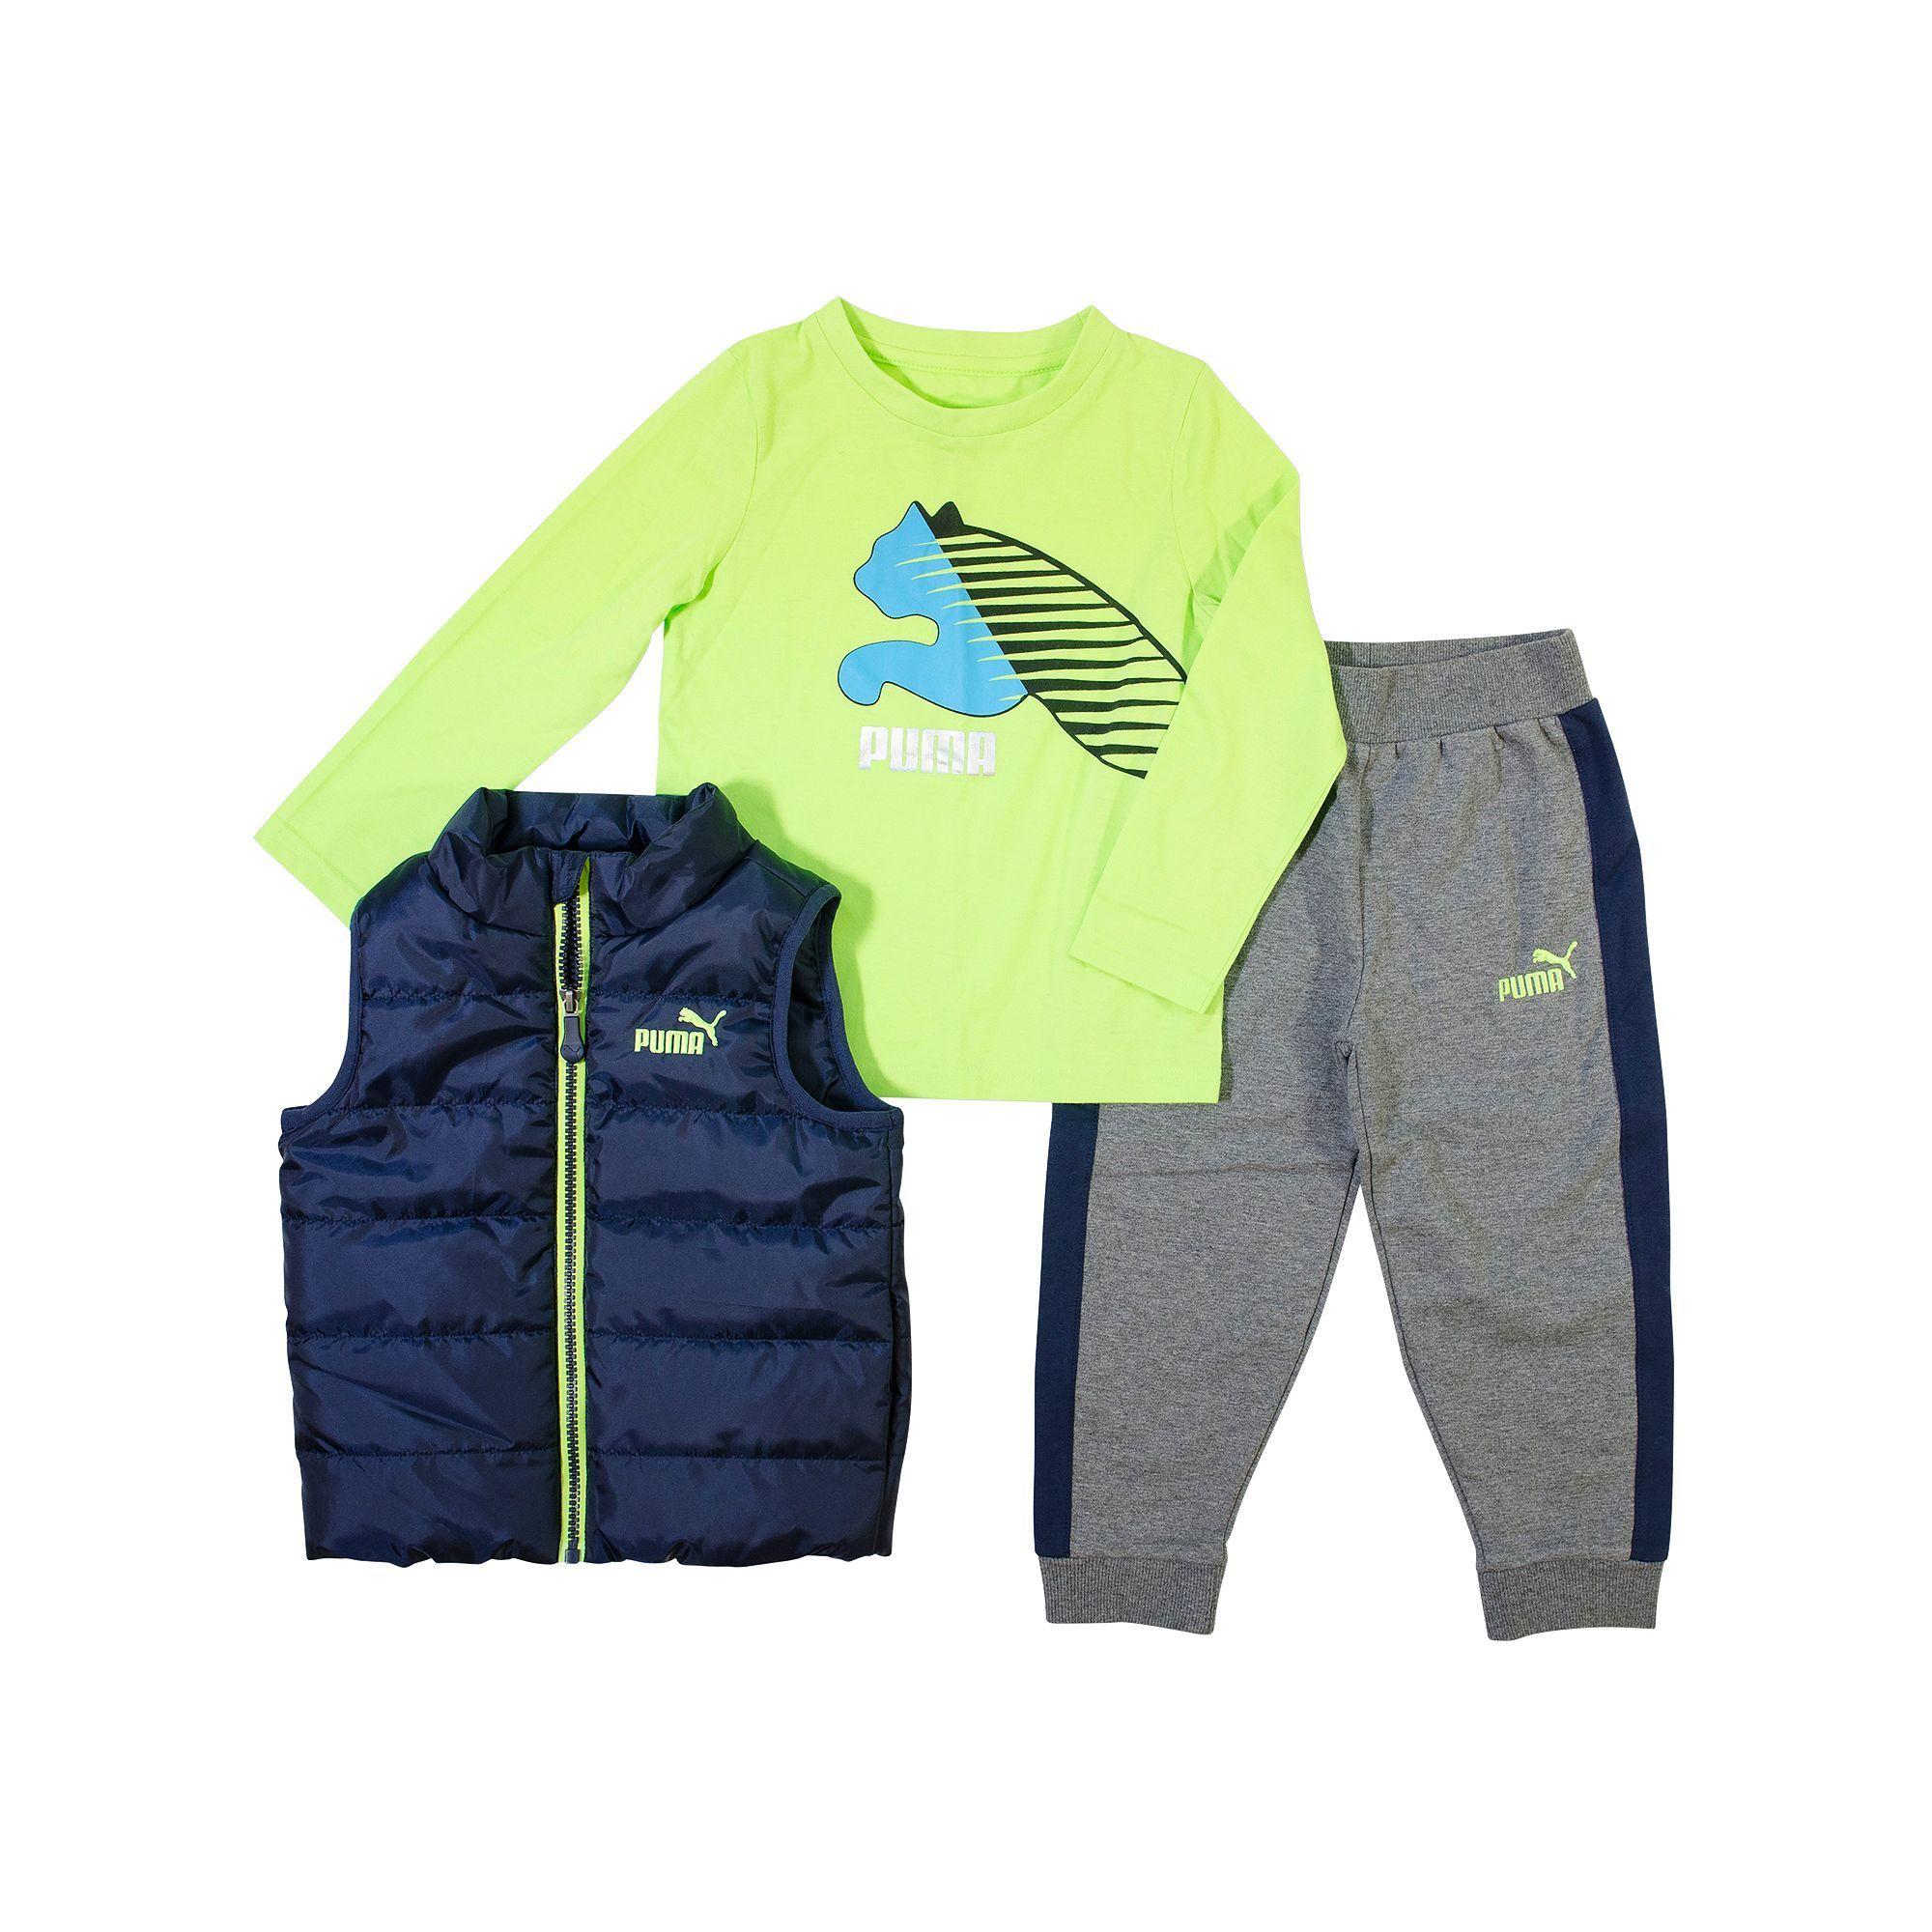 Boys 4 7 PUMA Quilted Vest, Tee & Logo Jogger Pants Set